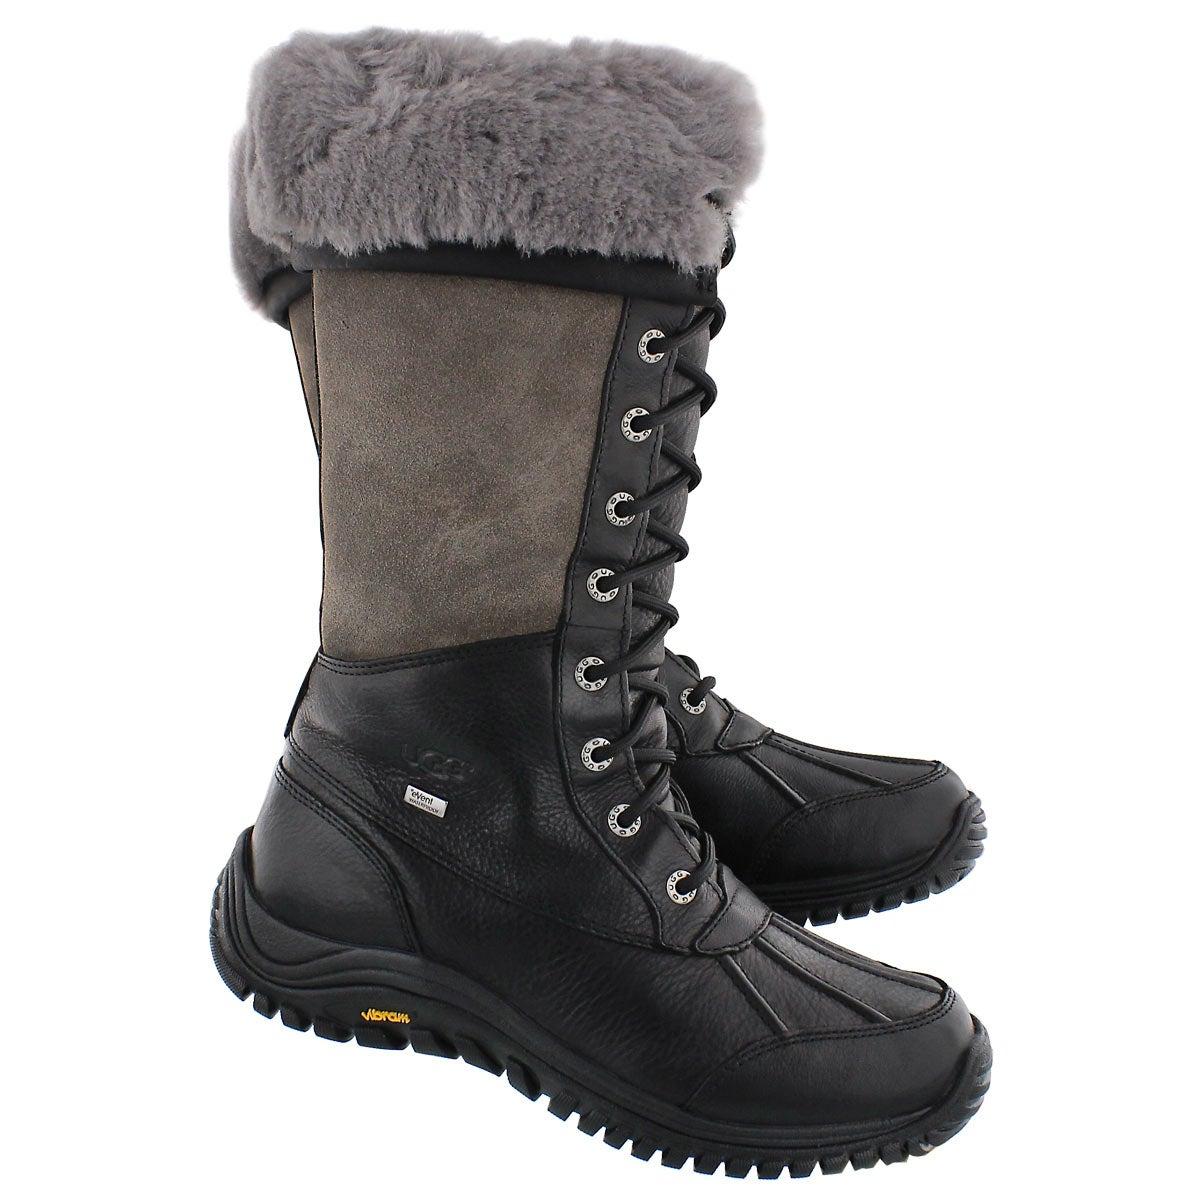 Lds Adirondack tall black winter boot